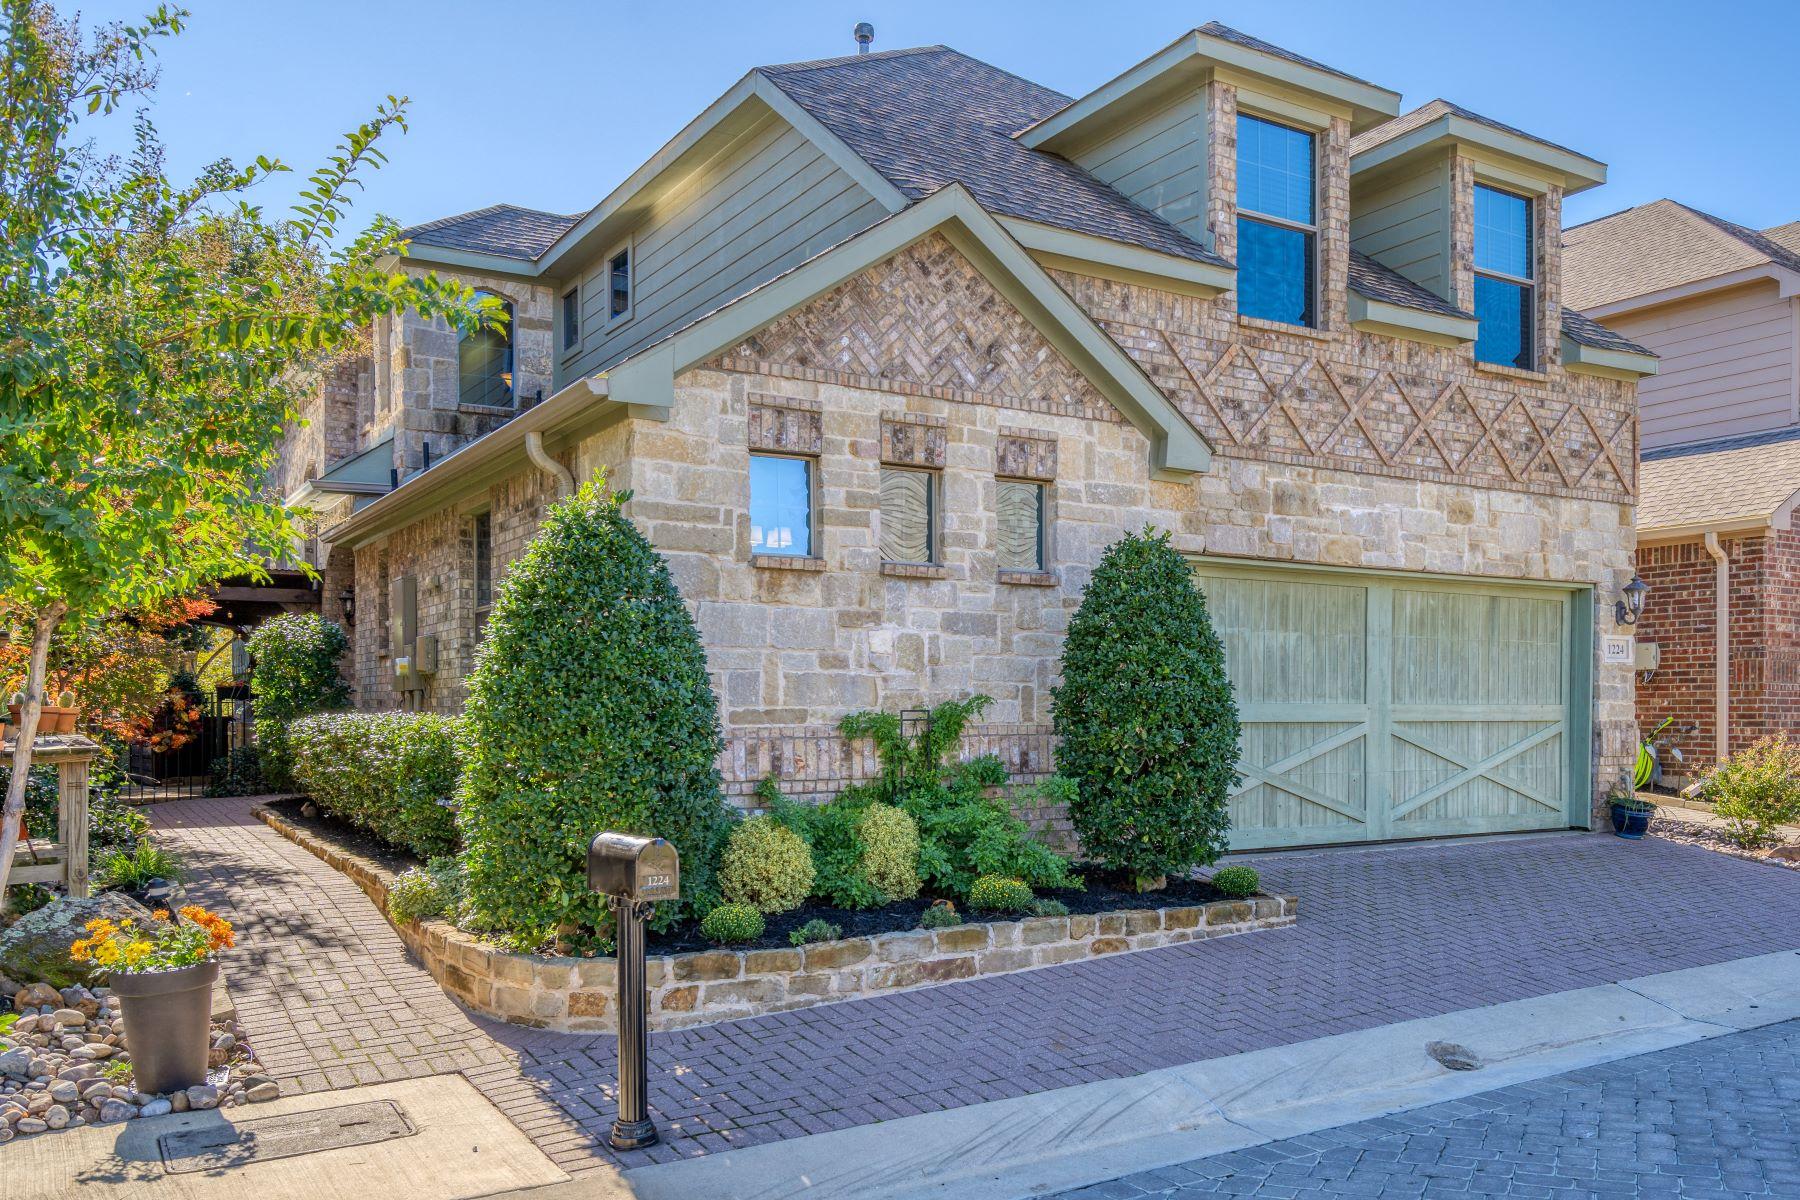 Single Family Homes for Sale at Rare Opportunity Awaits in Keller Town Center 1224 Fowler Street Keller, Texas 76248 United States